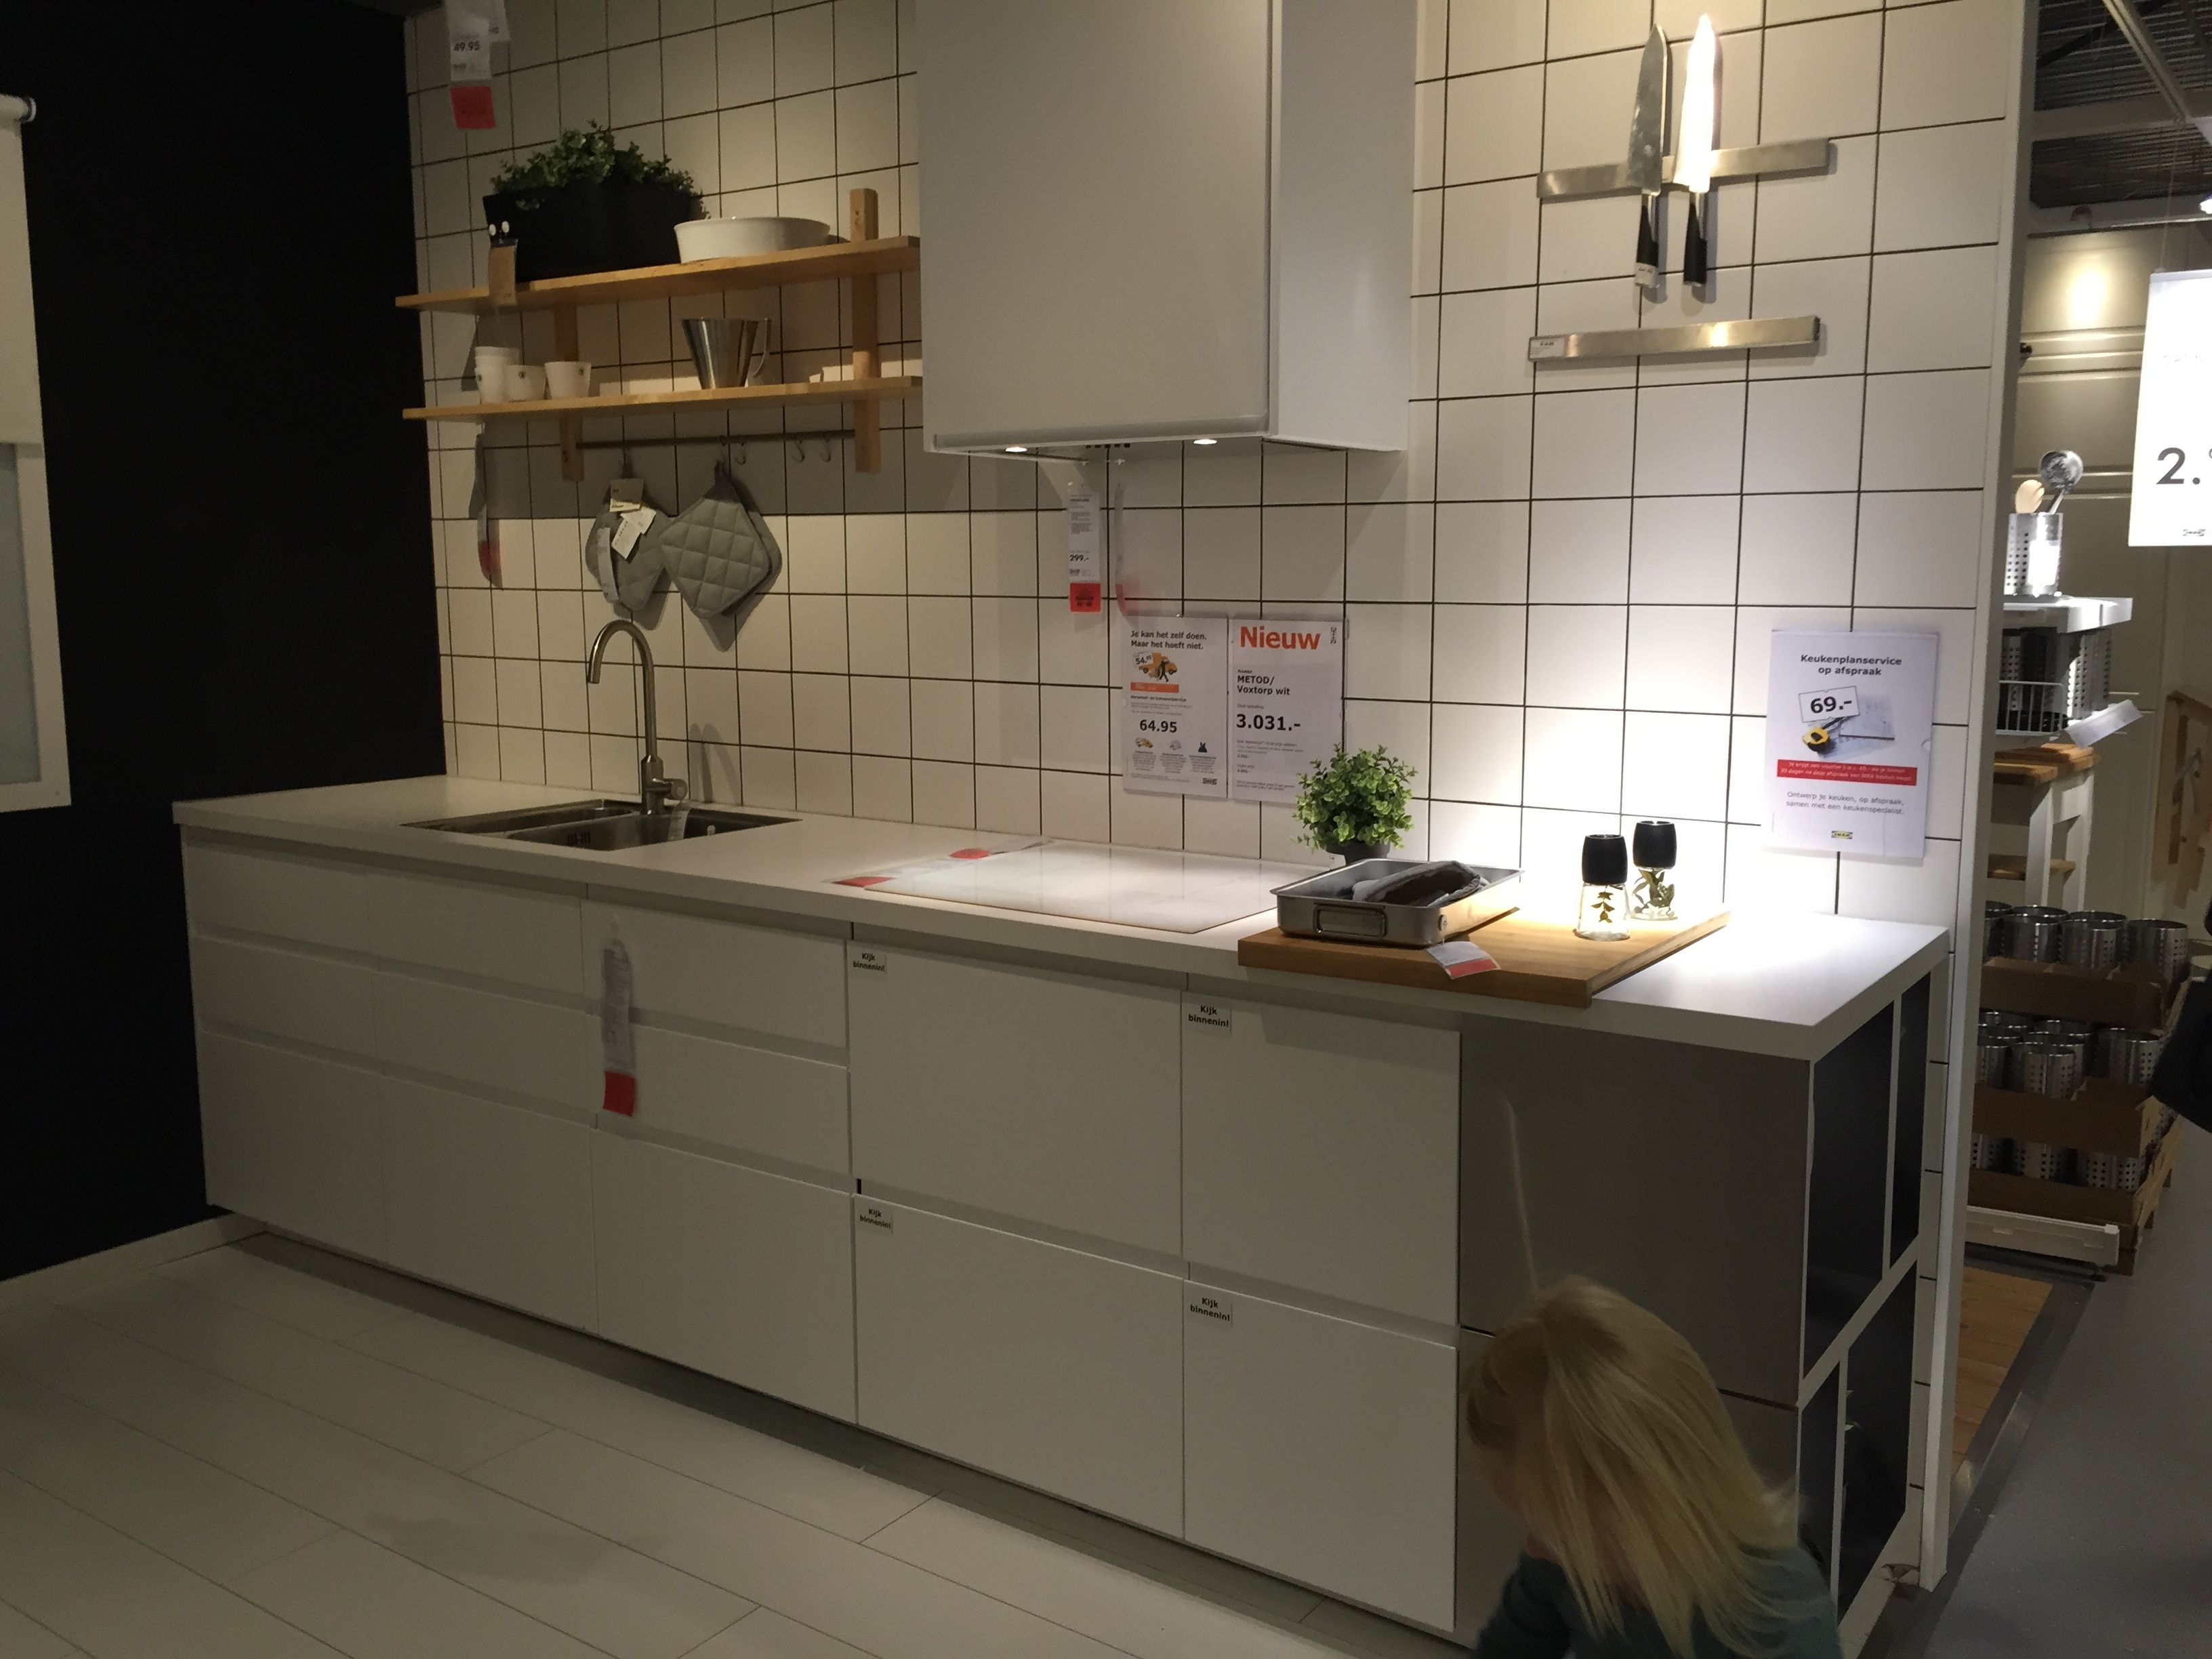 Küche Ikea Voxtorp Cuisine Voxtorp Blanc Inspirational Cuisine